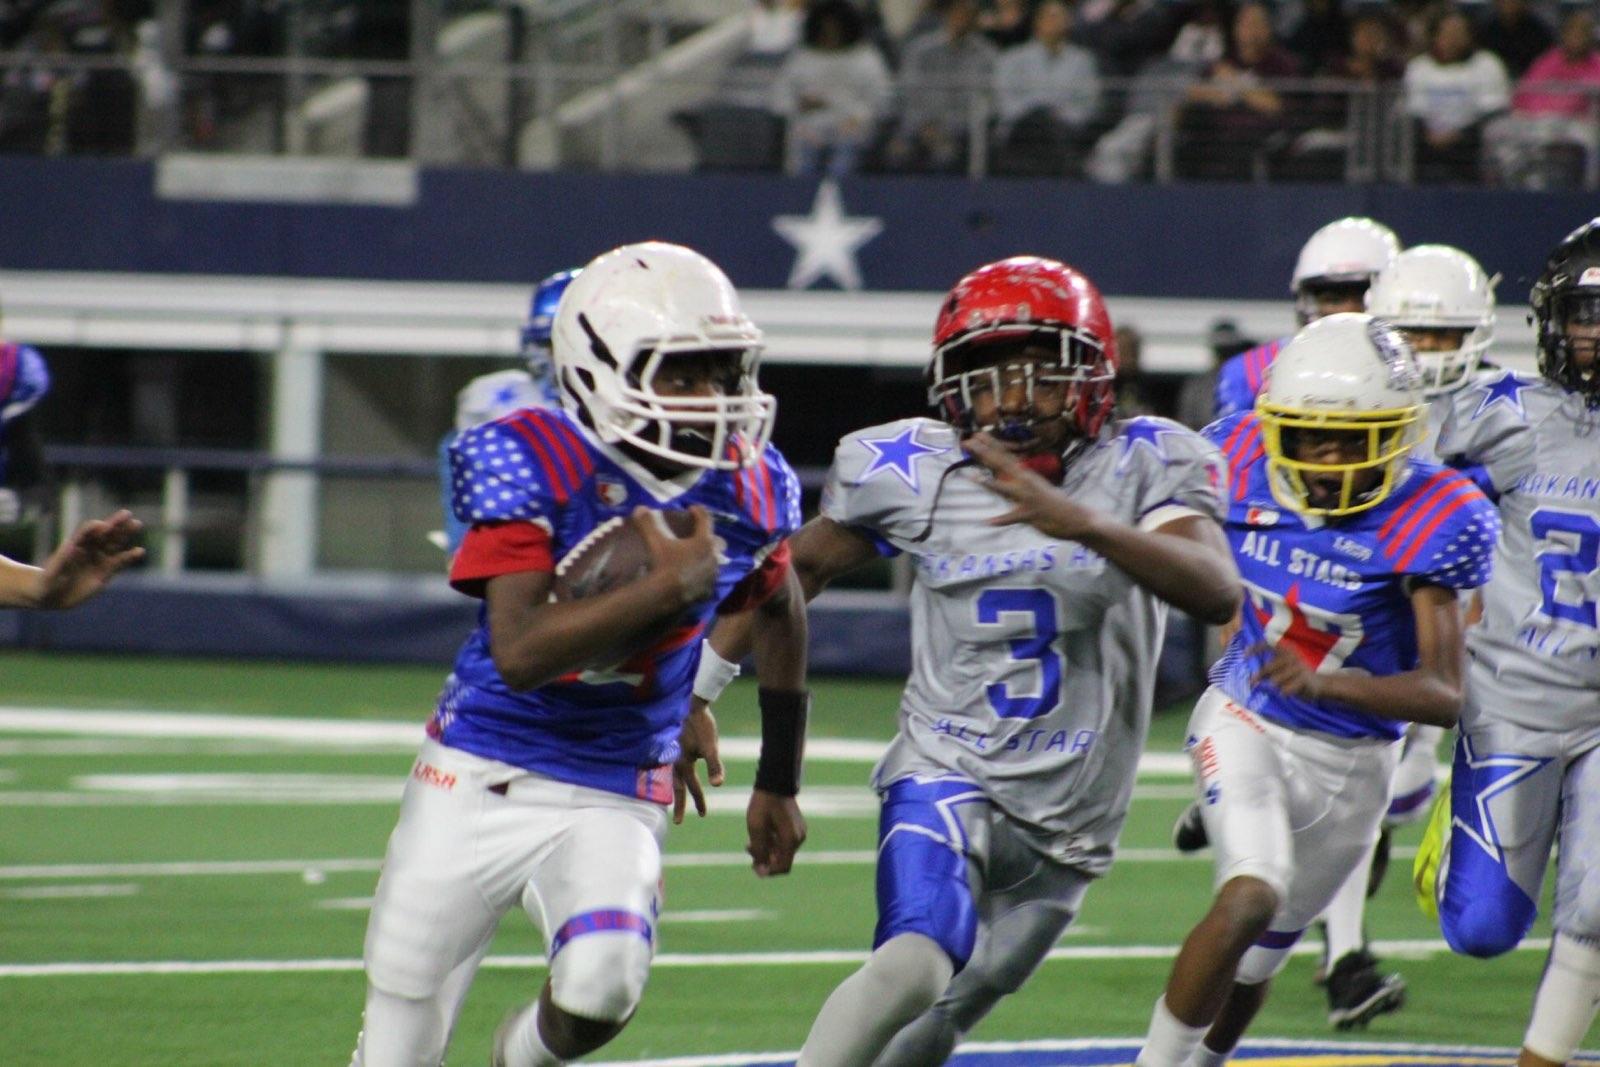 Welcome Texas Aau Youth Football League